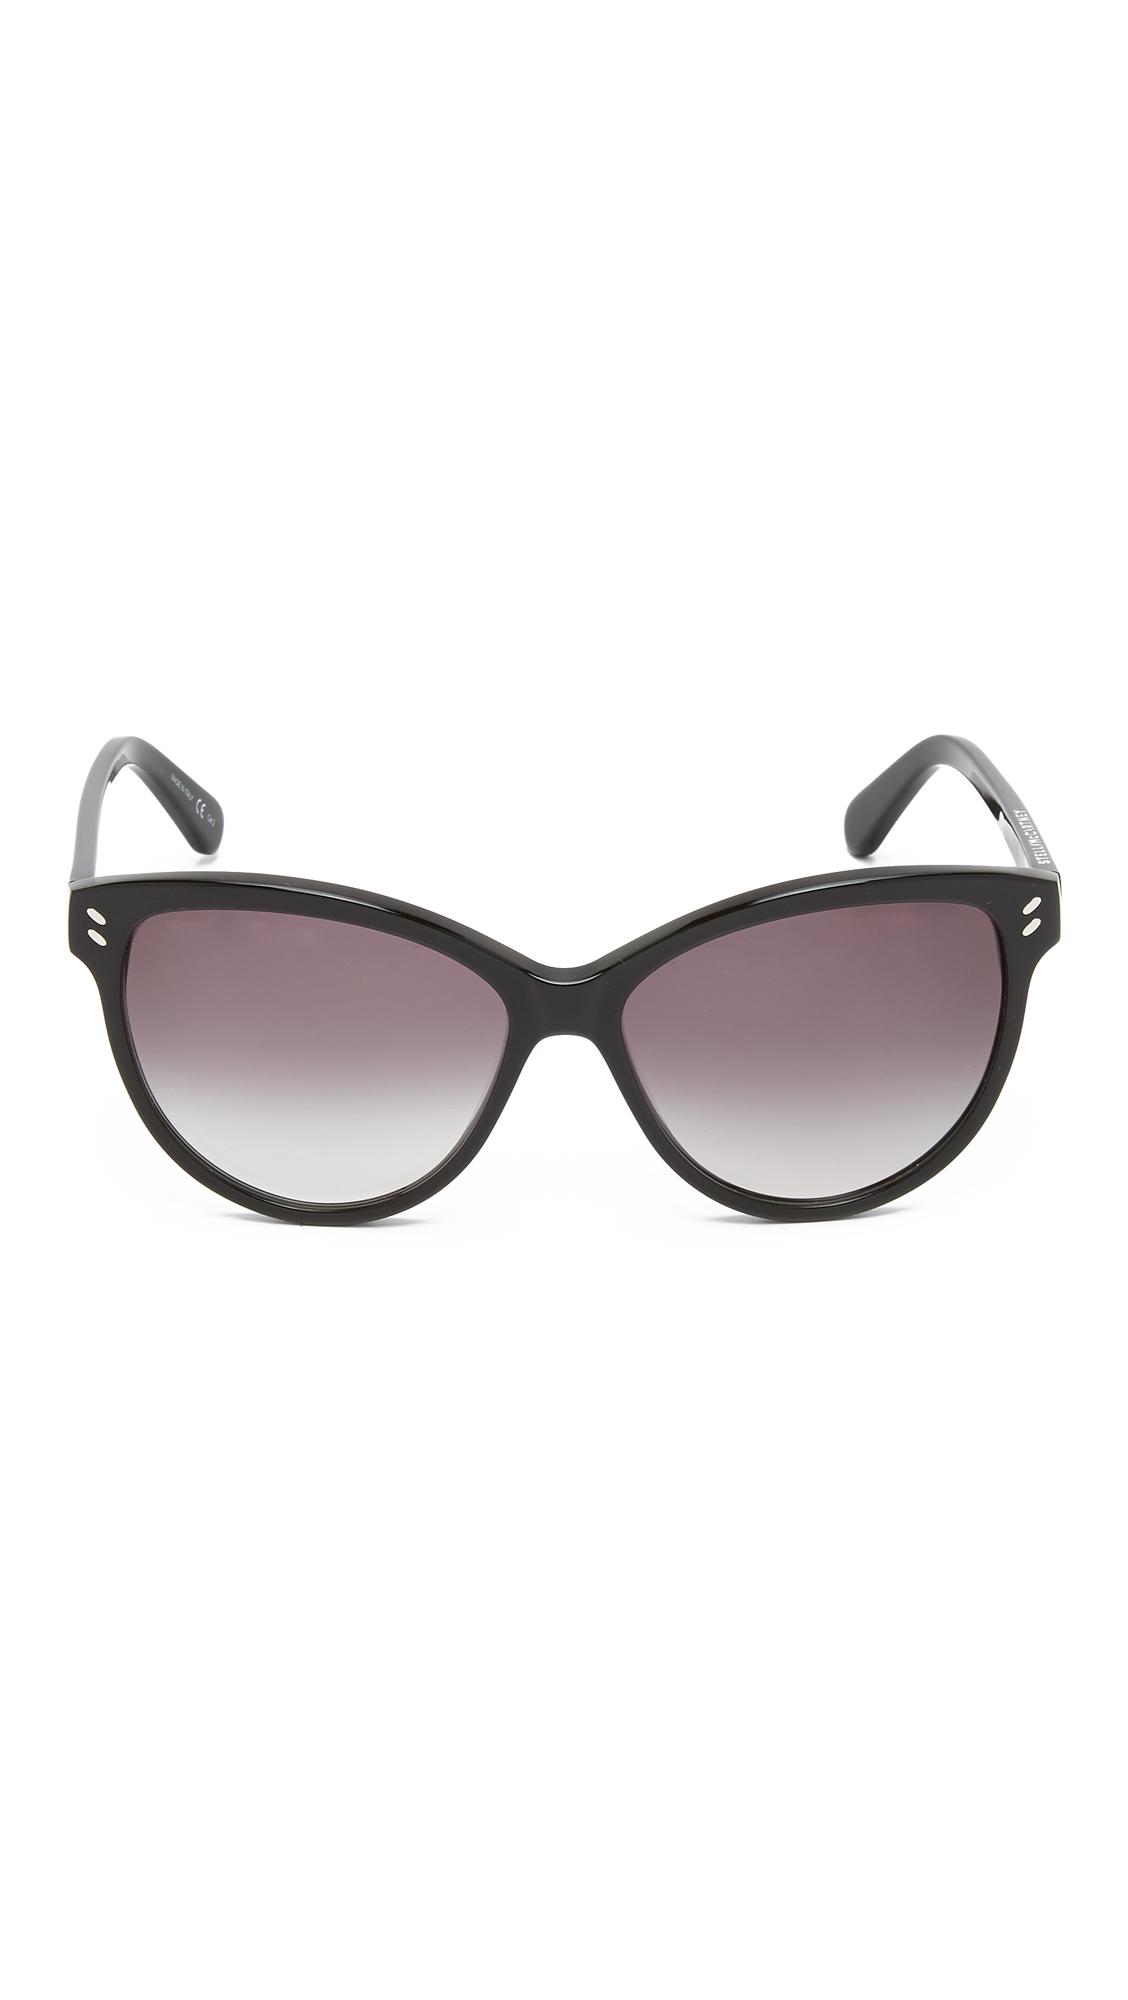 6e814566c304 Stella McCartney Classic Cat Eye Sunglasses